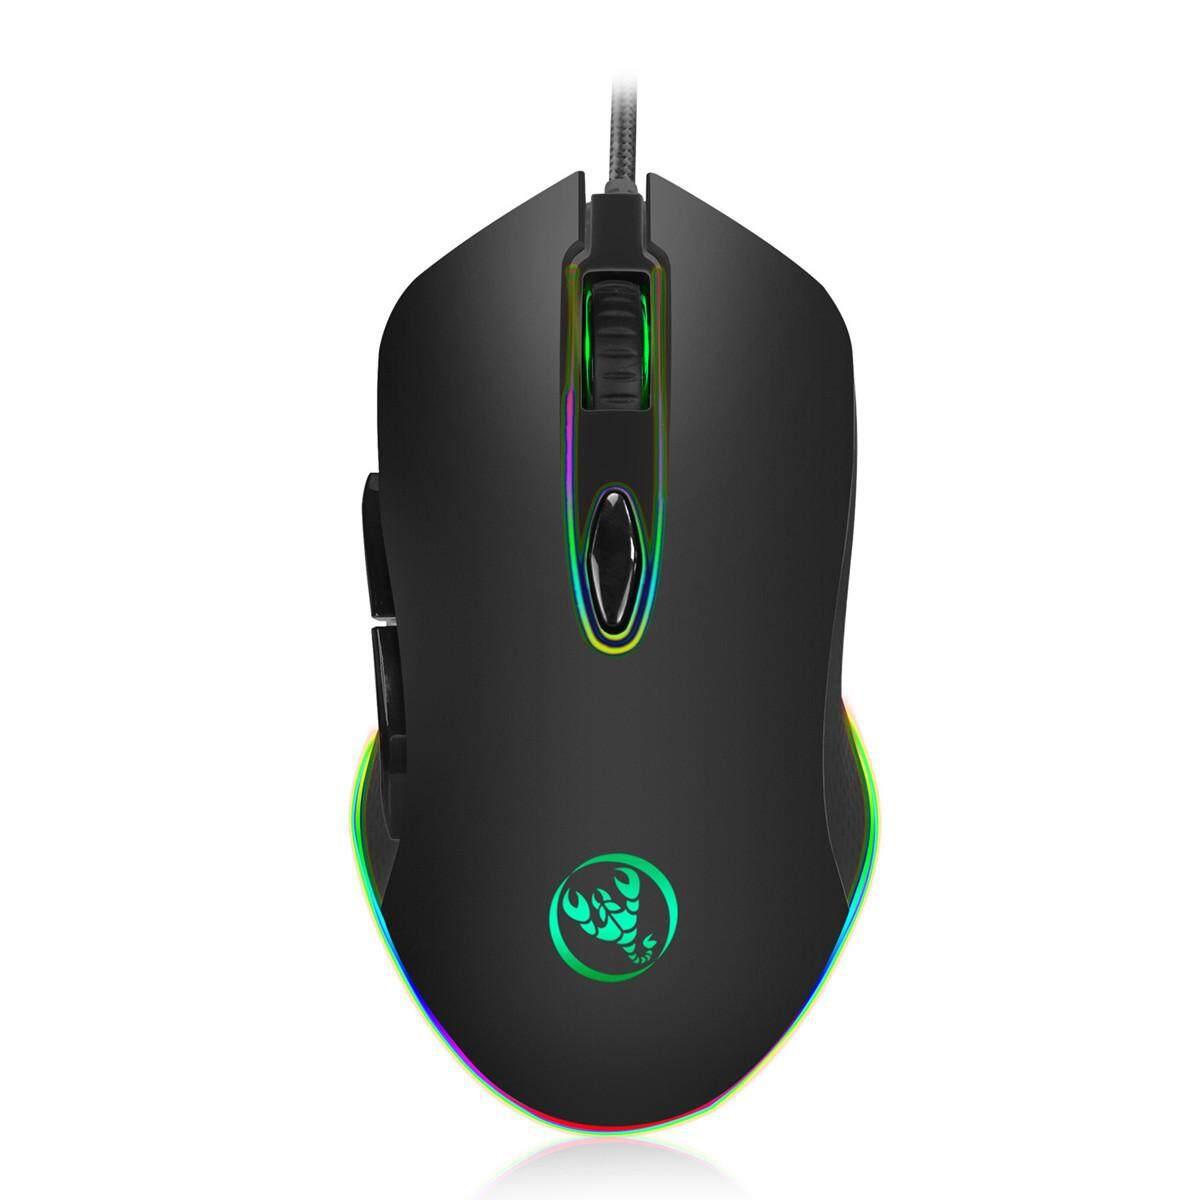 Cek Harga Fantech Sp25 X7 Blast 4800 Dpi Usb Optical Macro Rgb Mouse Gaming Pro Rhasta G10 Chroma 4 Button Hxsj S500 Game 6 Programmable Keys Light 12 Level Adjustable 200